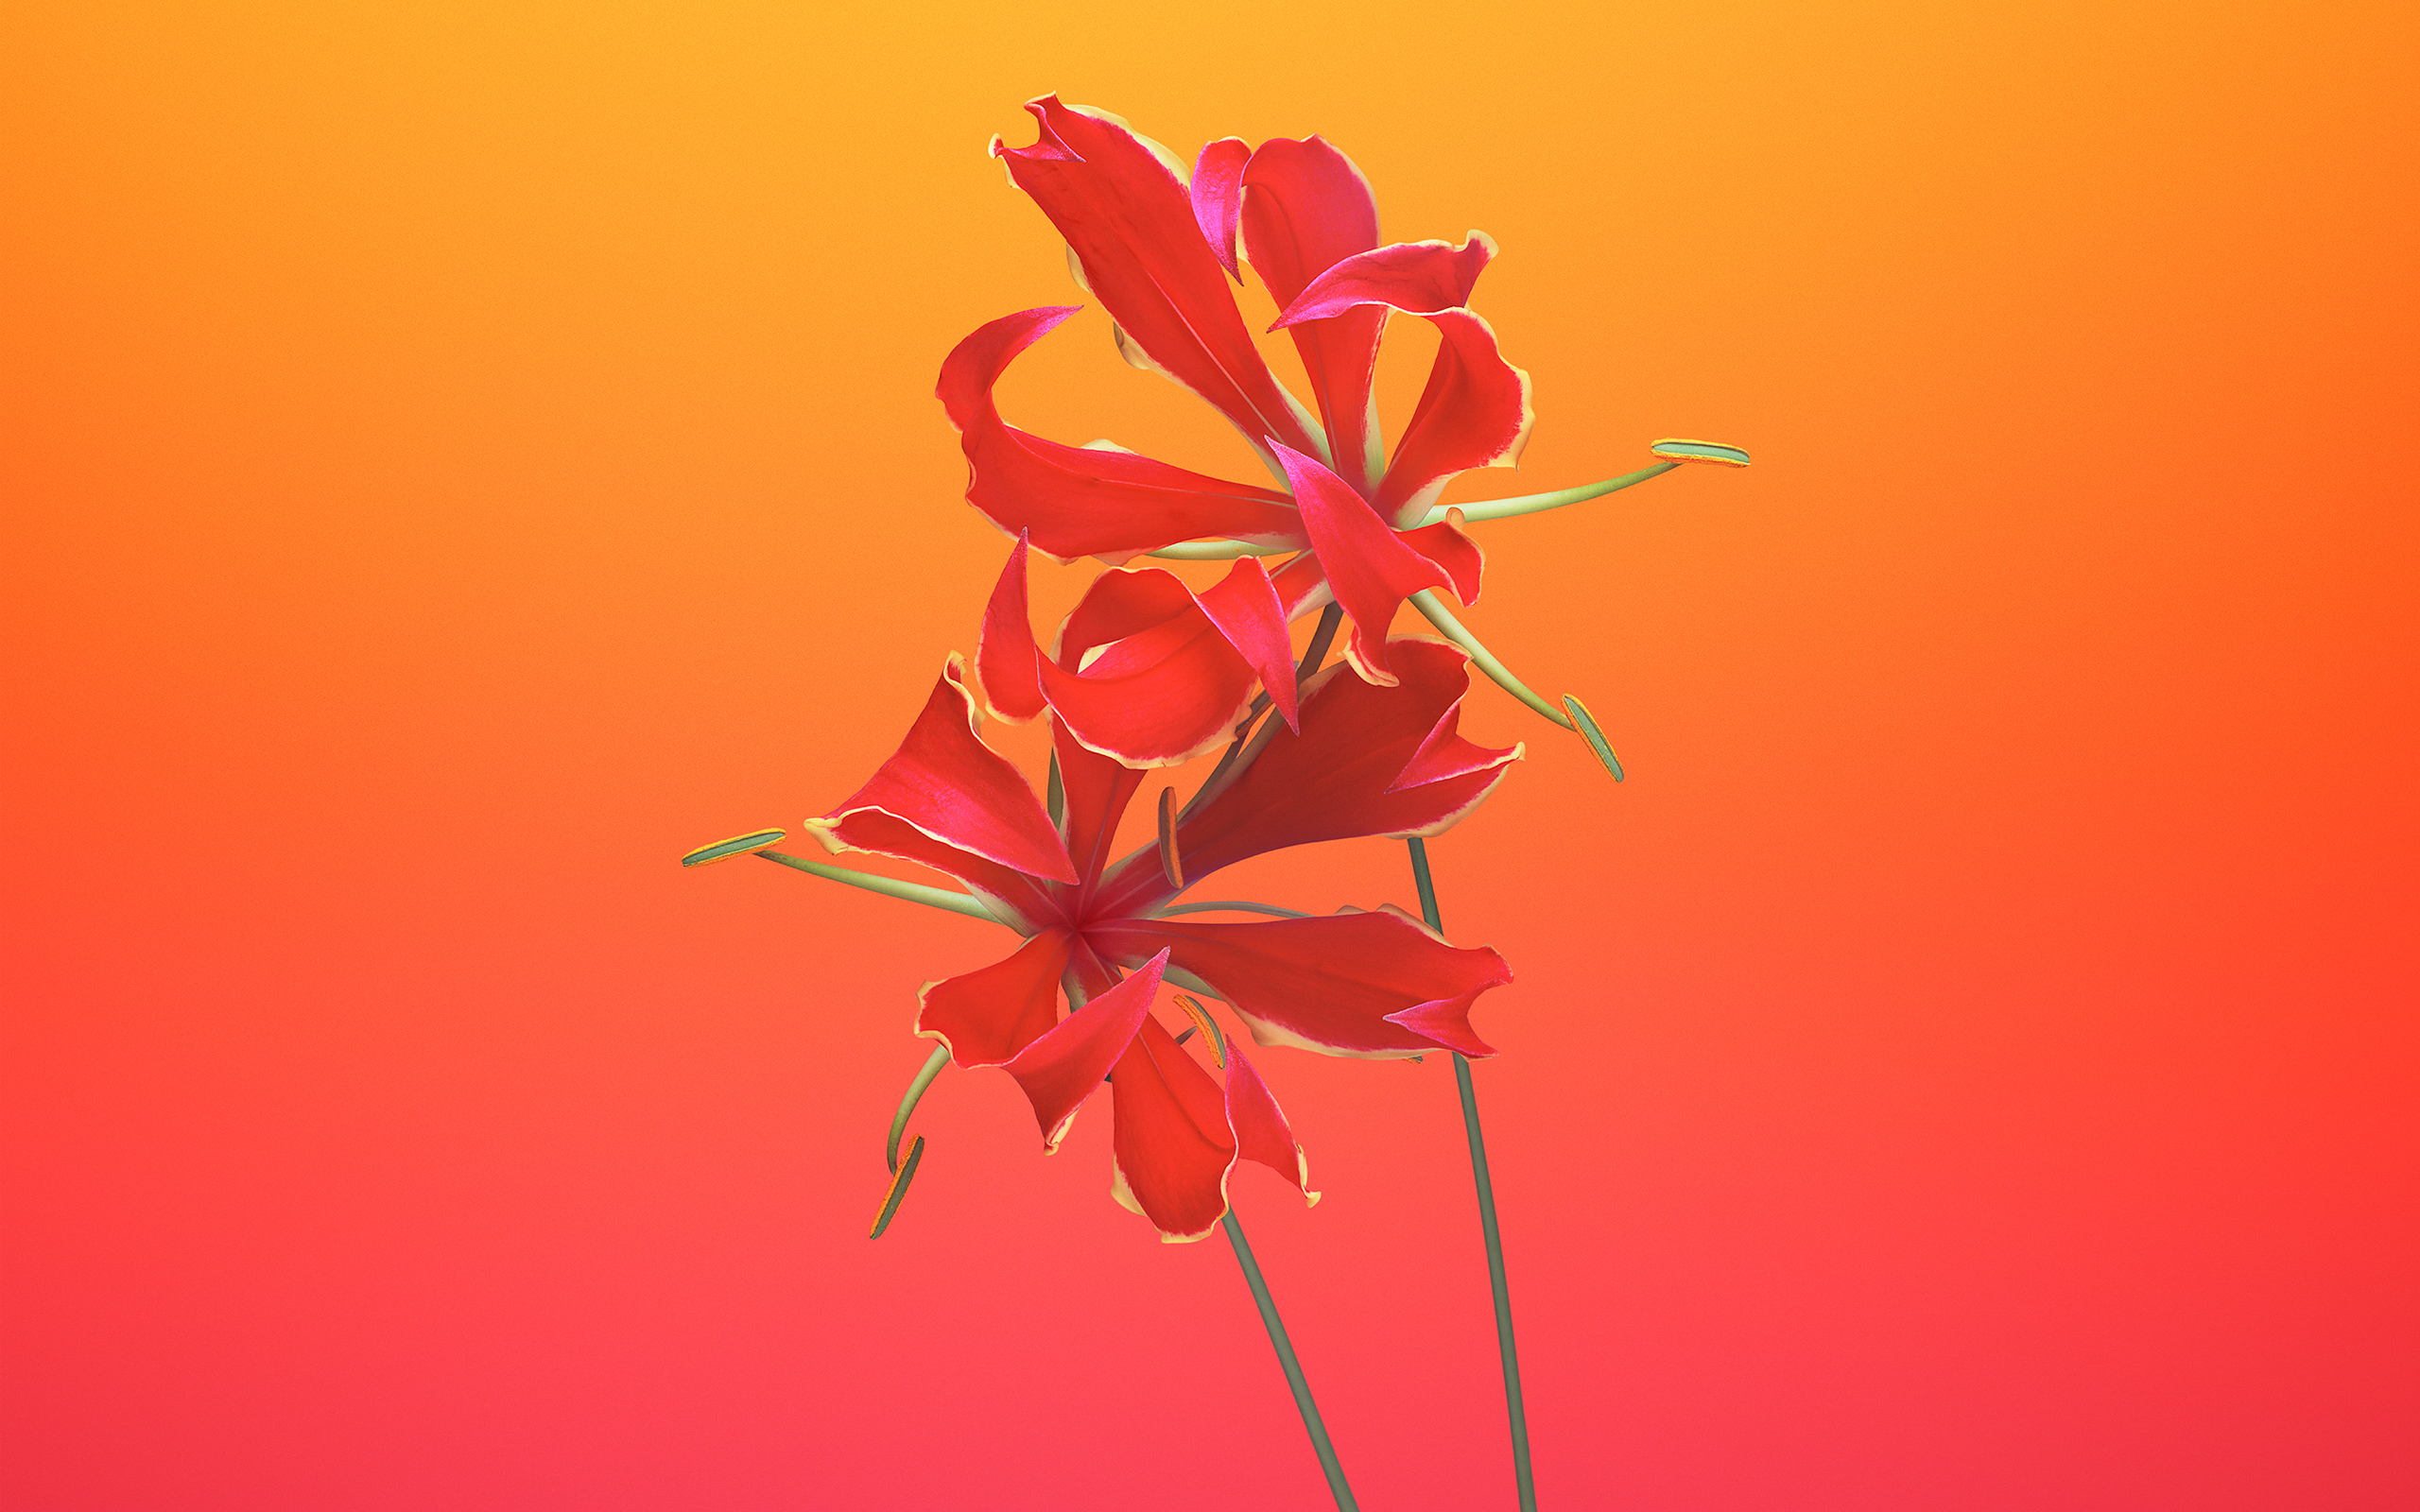 Gloriosa цветок IOS 11 iPhone 8 iPhone х акций обои скачать